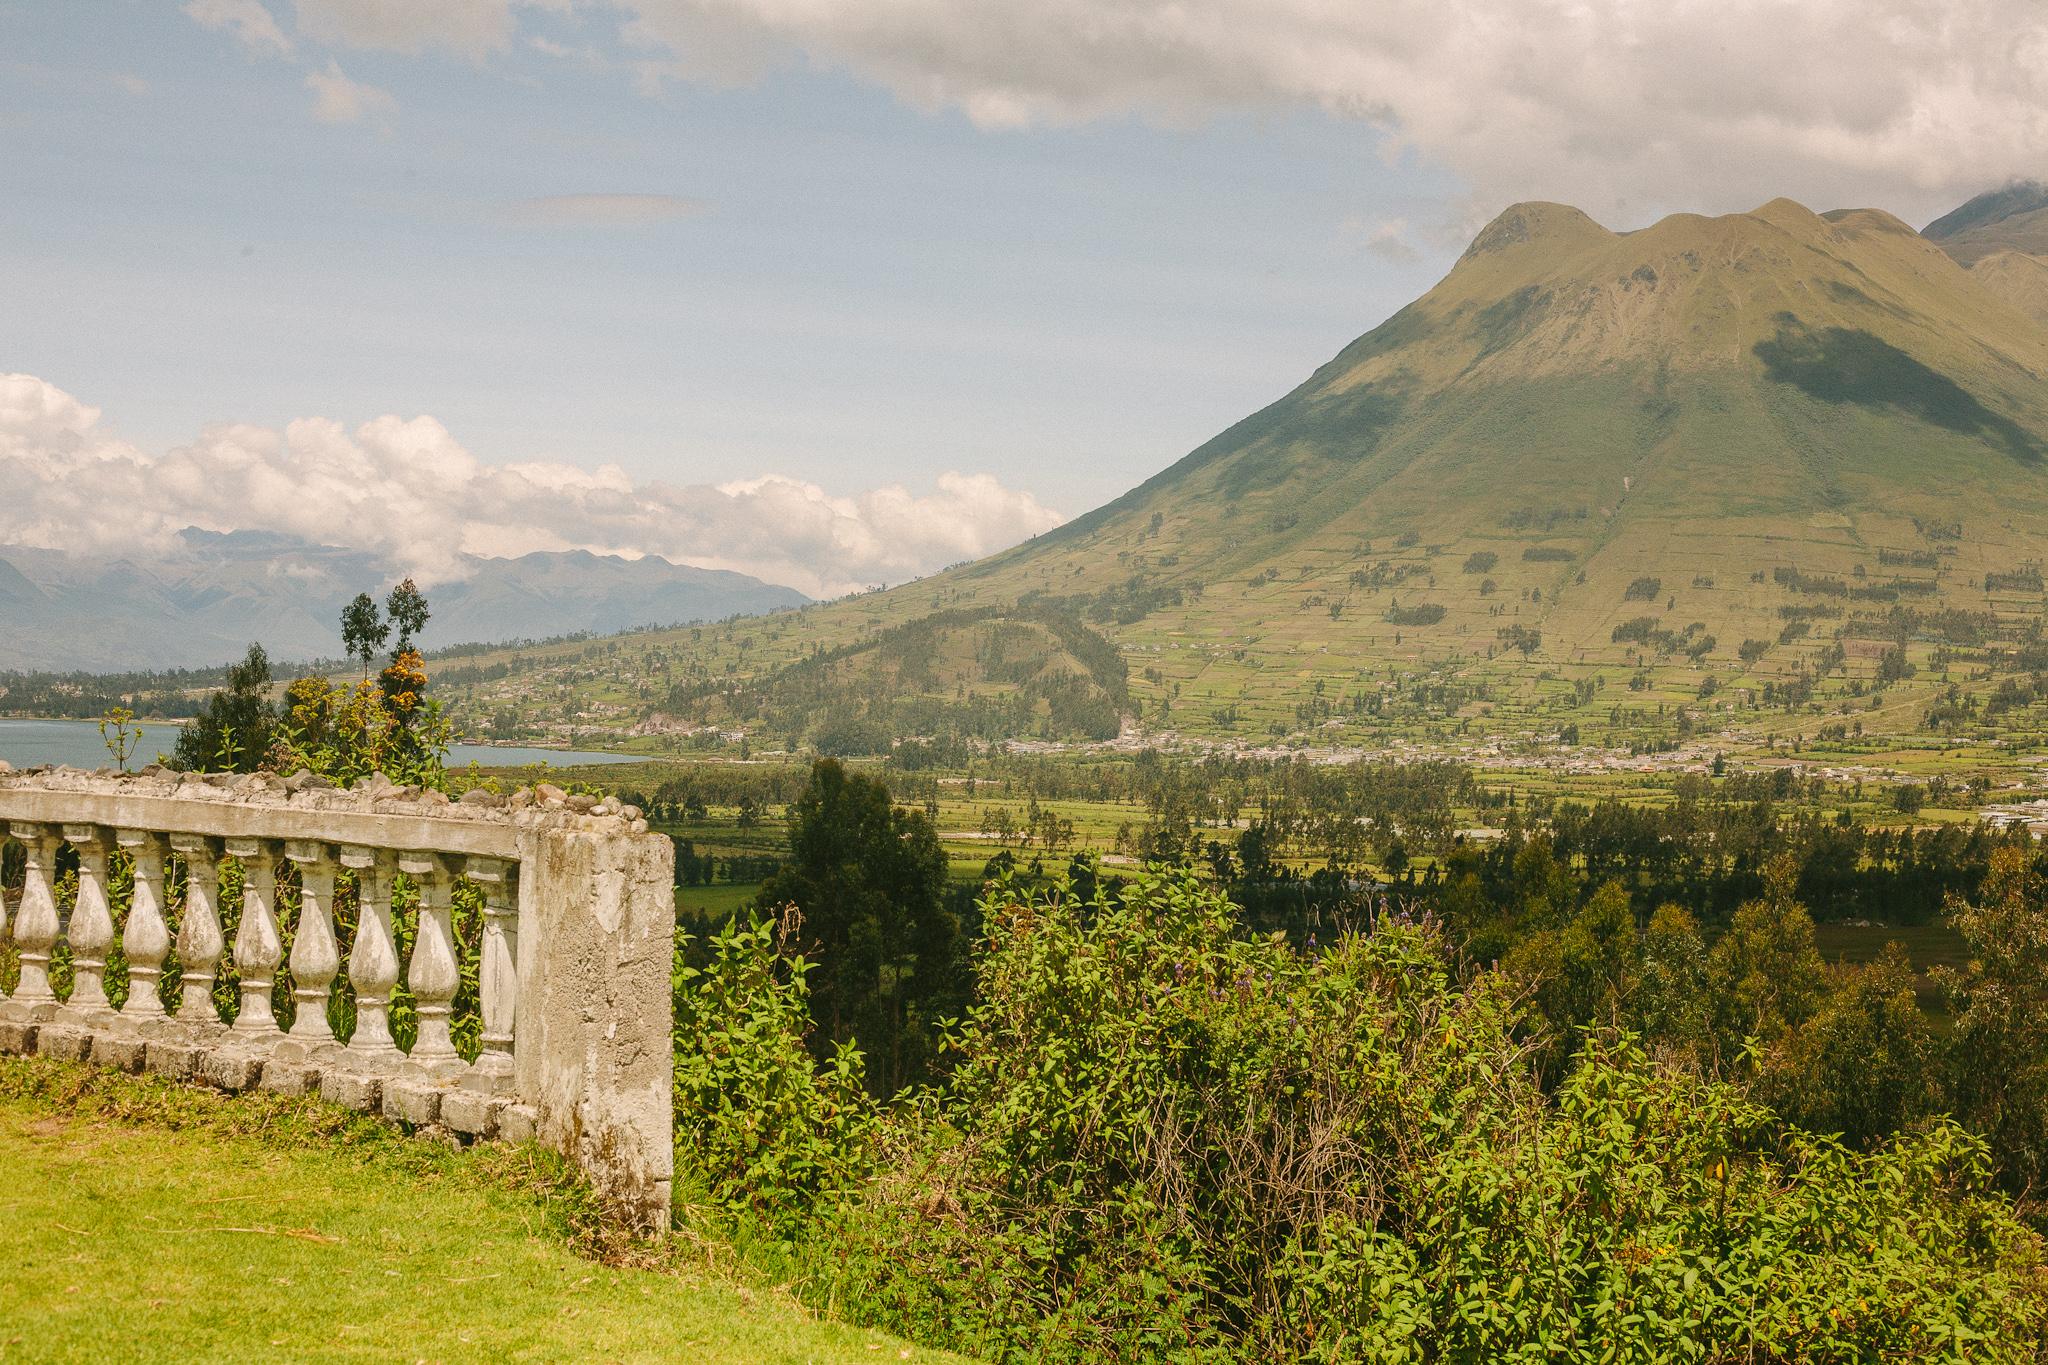 Ecuador2011_Mountains&Sea_Web_jenniferleahy-015.jpg